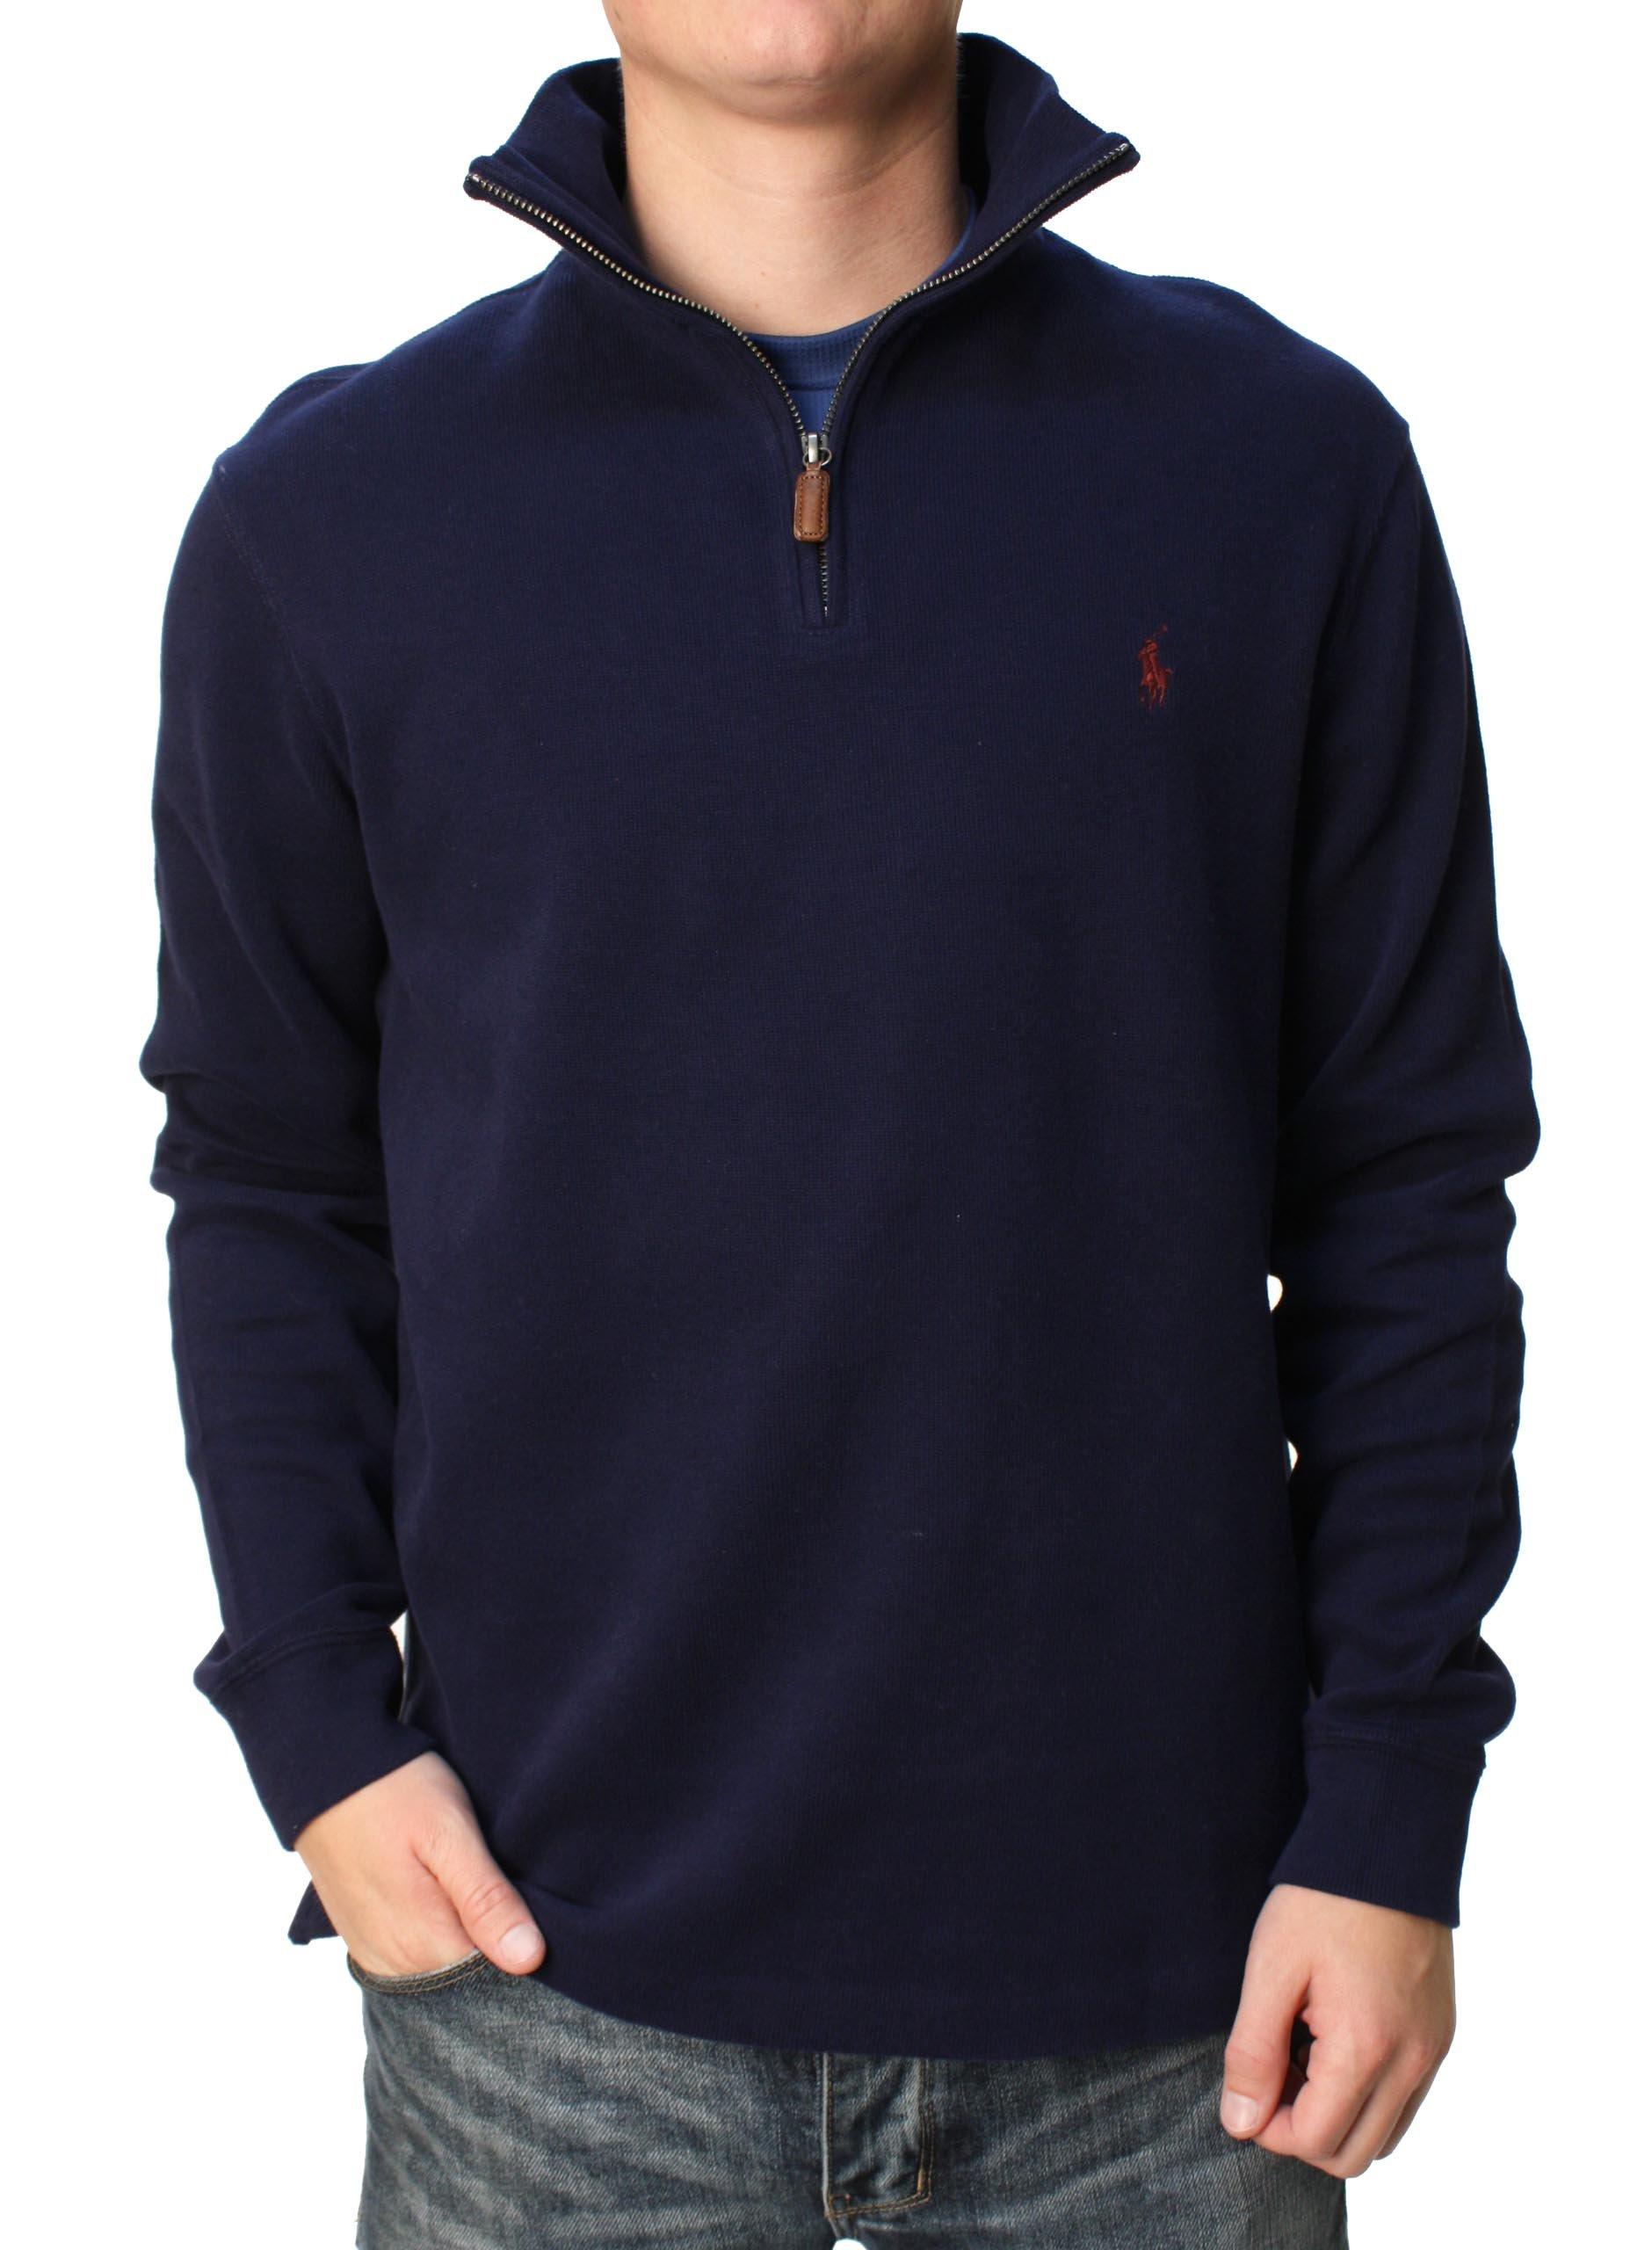 Polo Ralph Lauren Mens Half Zip French Rib Cotton Sweater (Large, Navy)